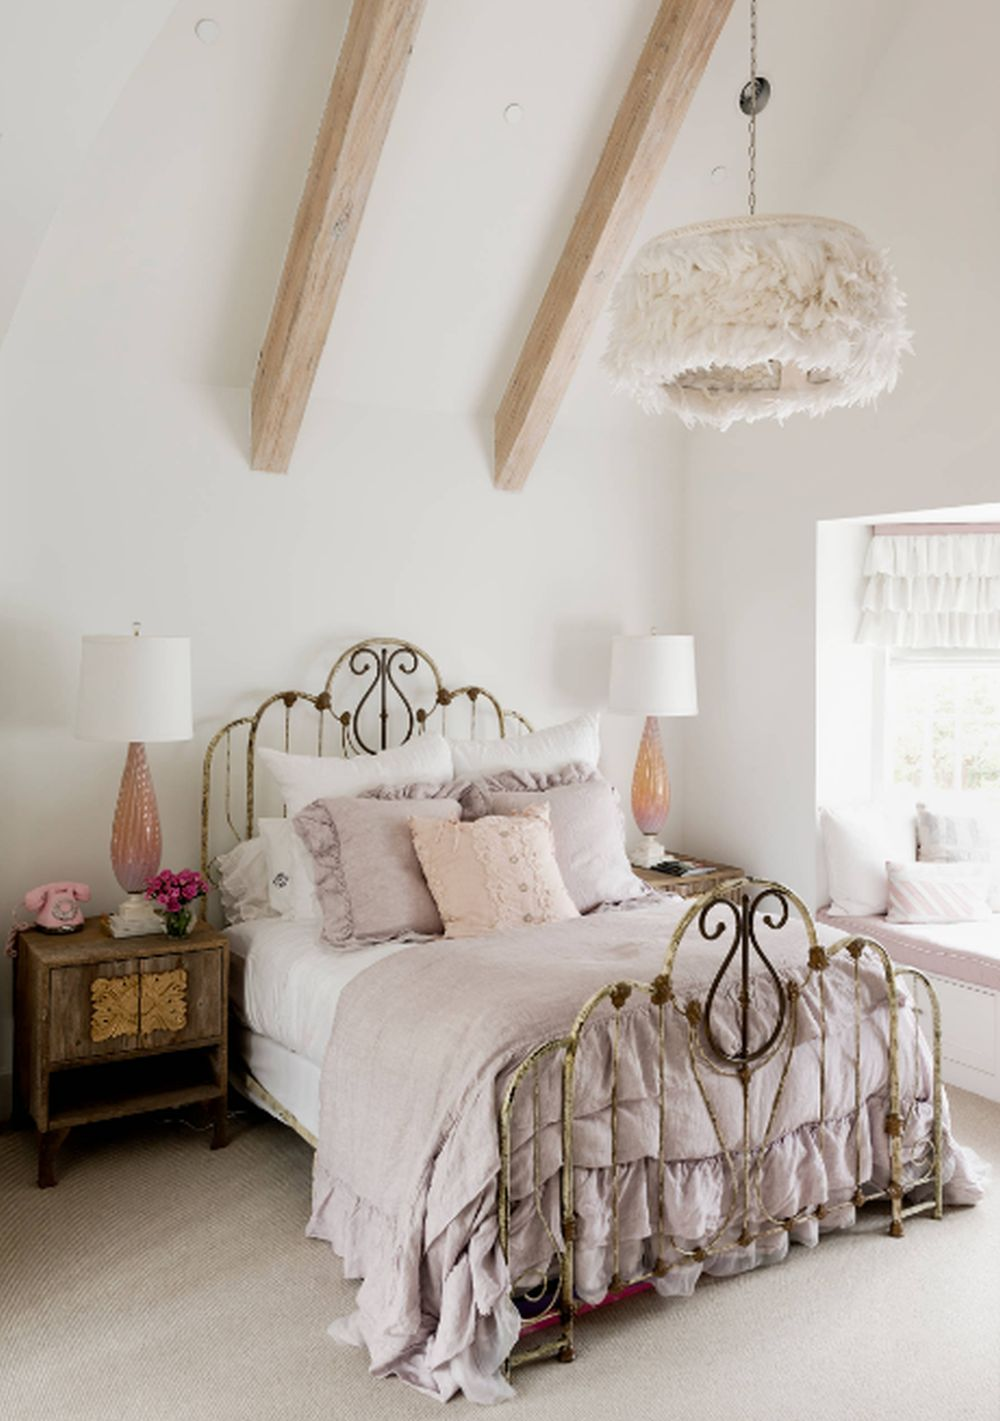 adelaparvu-com-despre-cum-iti-aranjezi-patul-foto-thompson-custom-homes